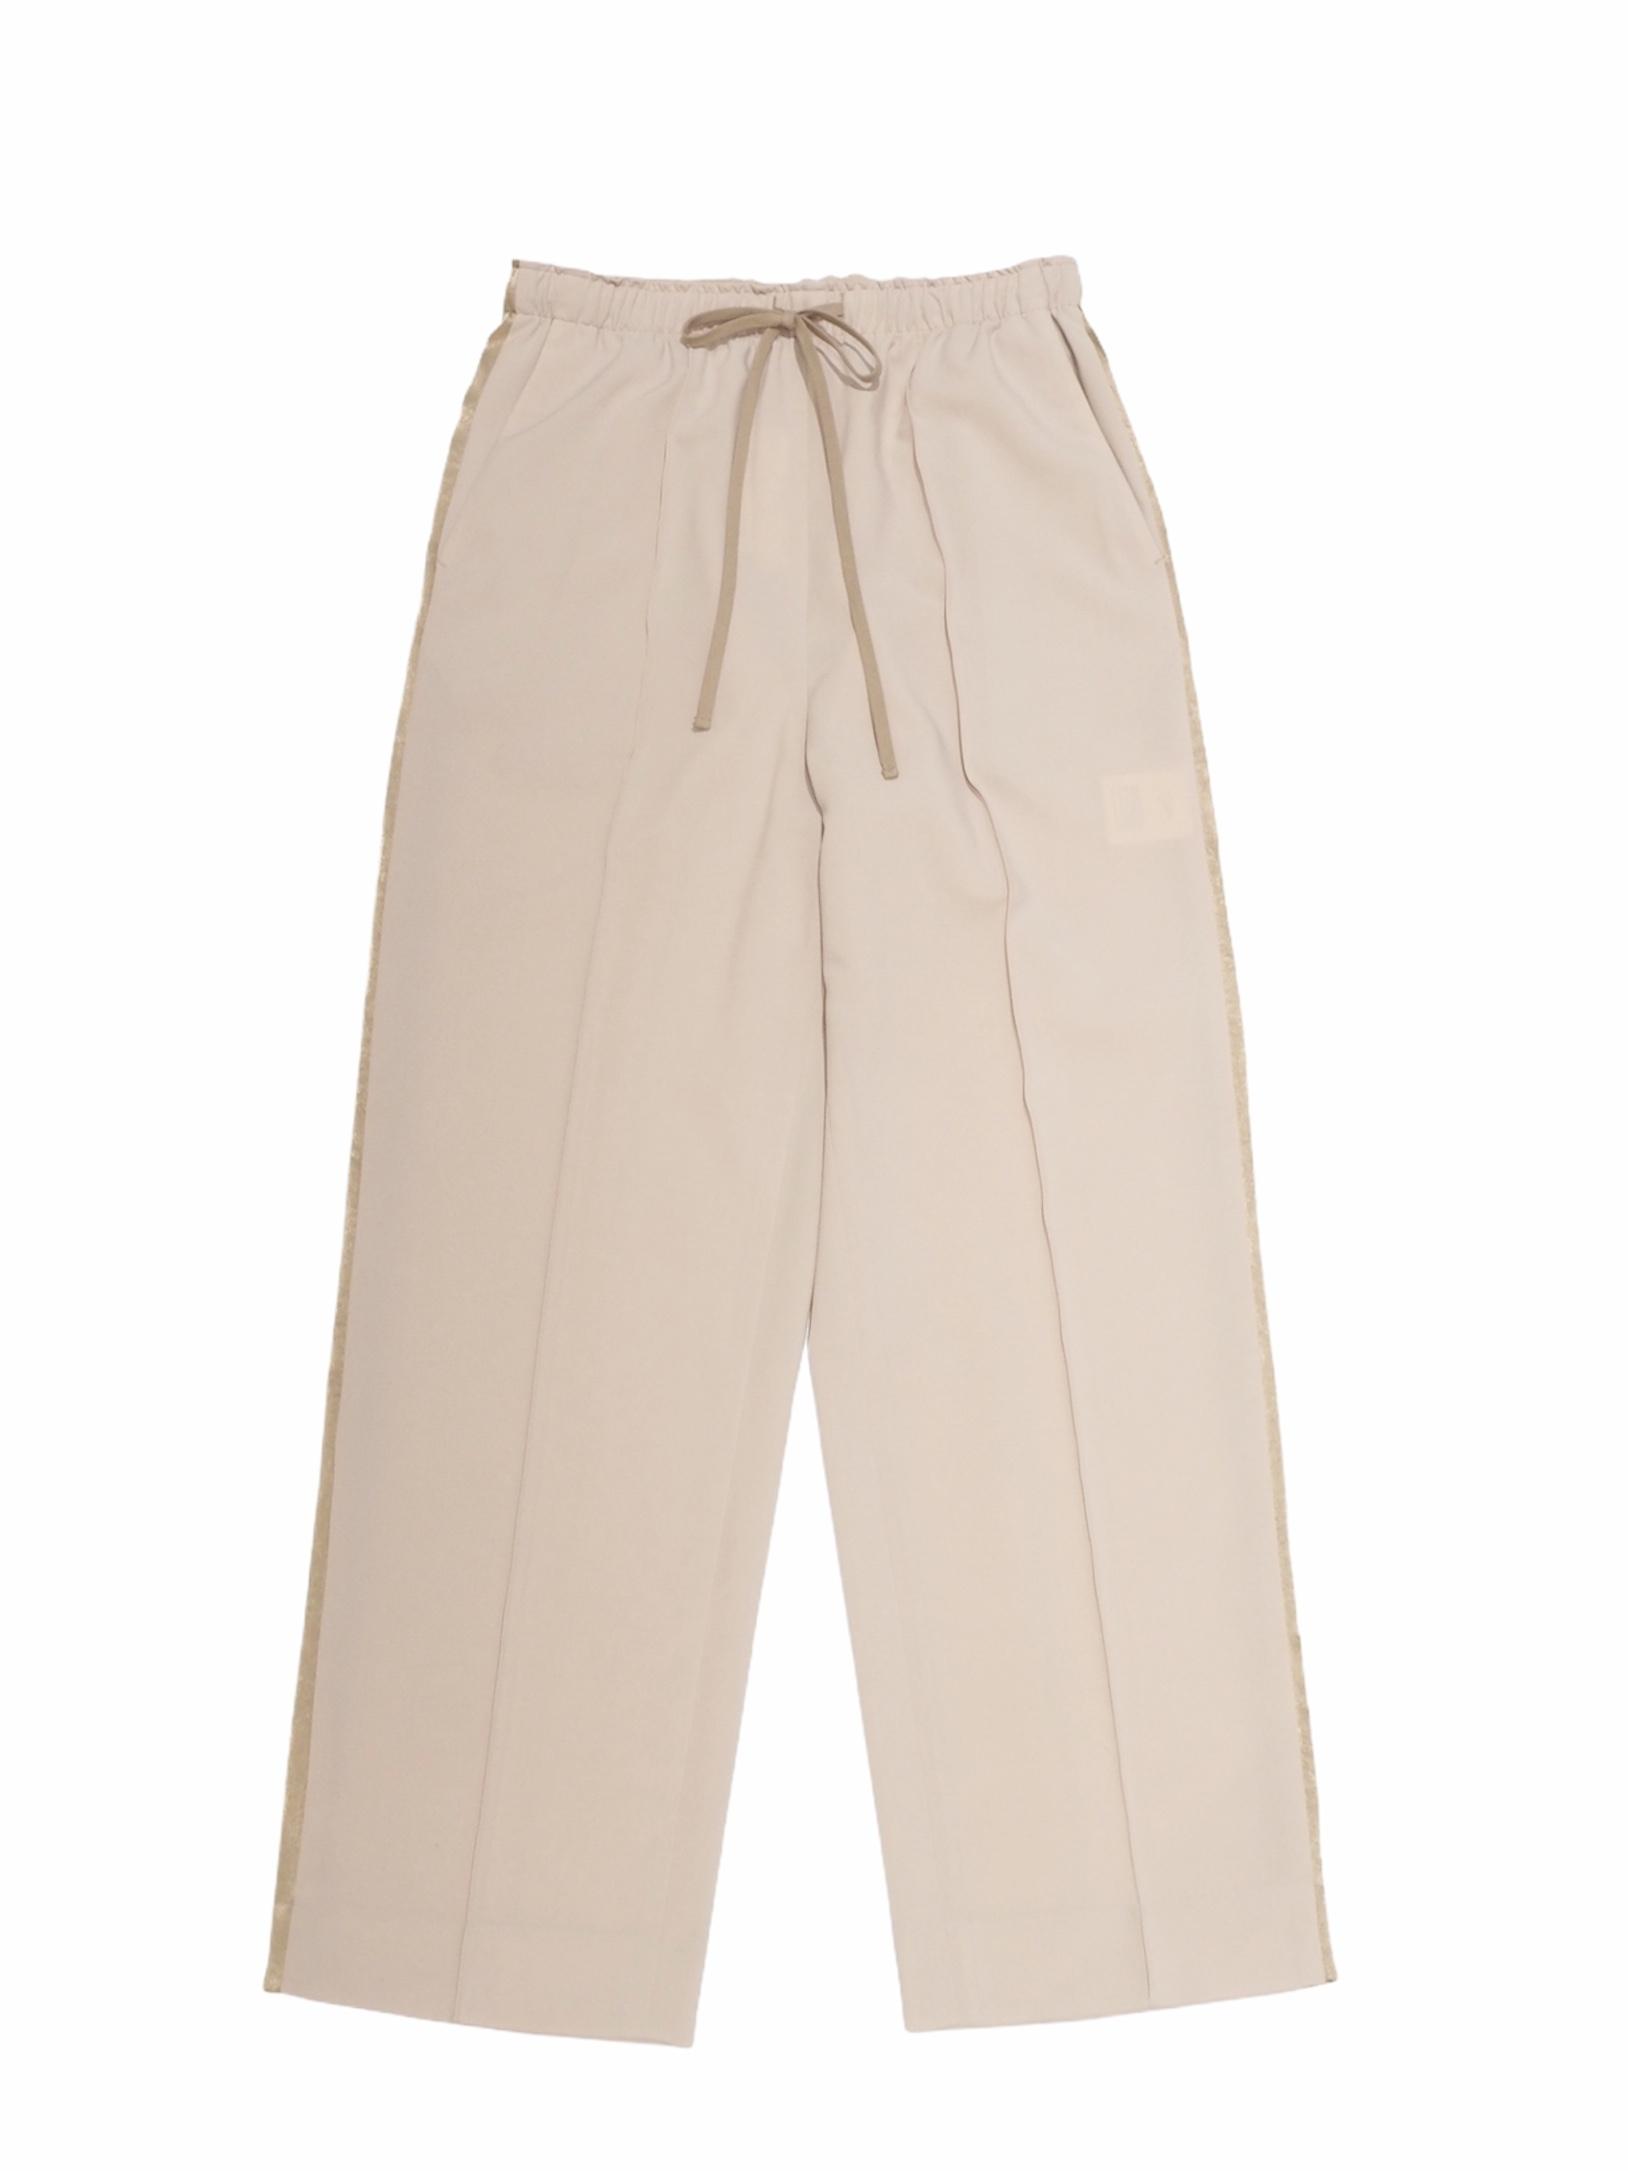 【ELIN】SIDE STRIPE ELASTIC PANTS